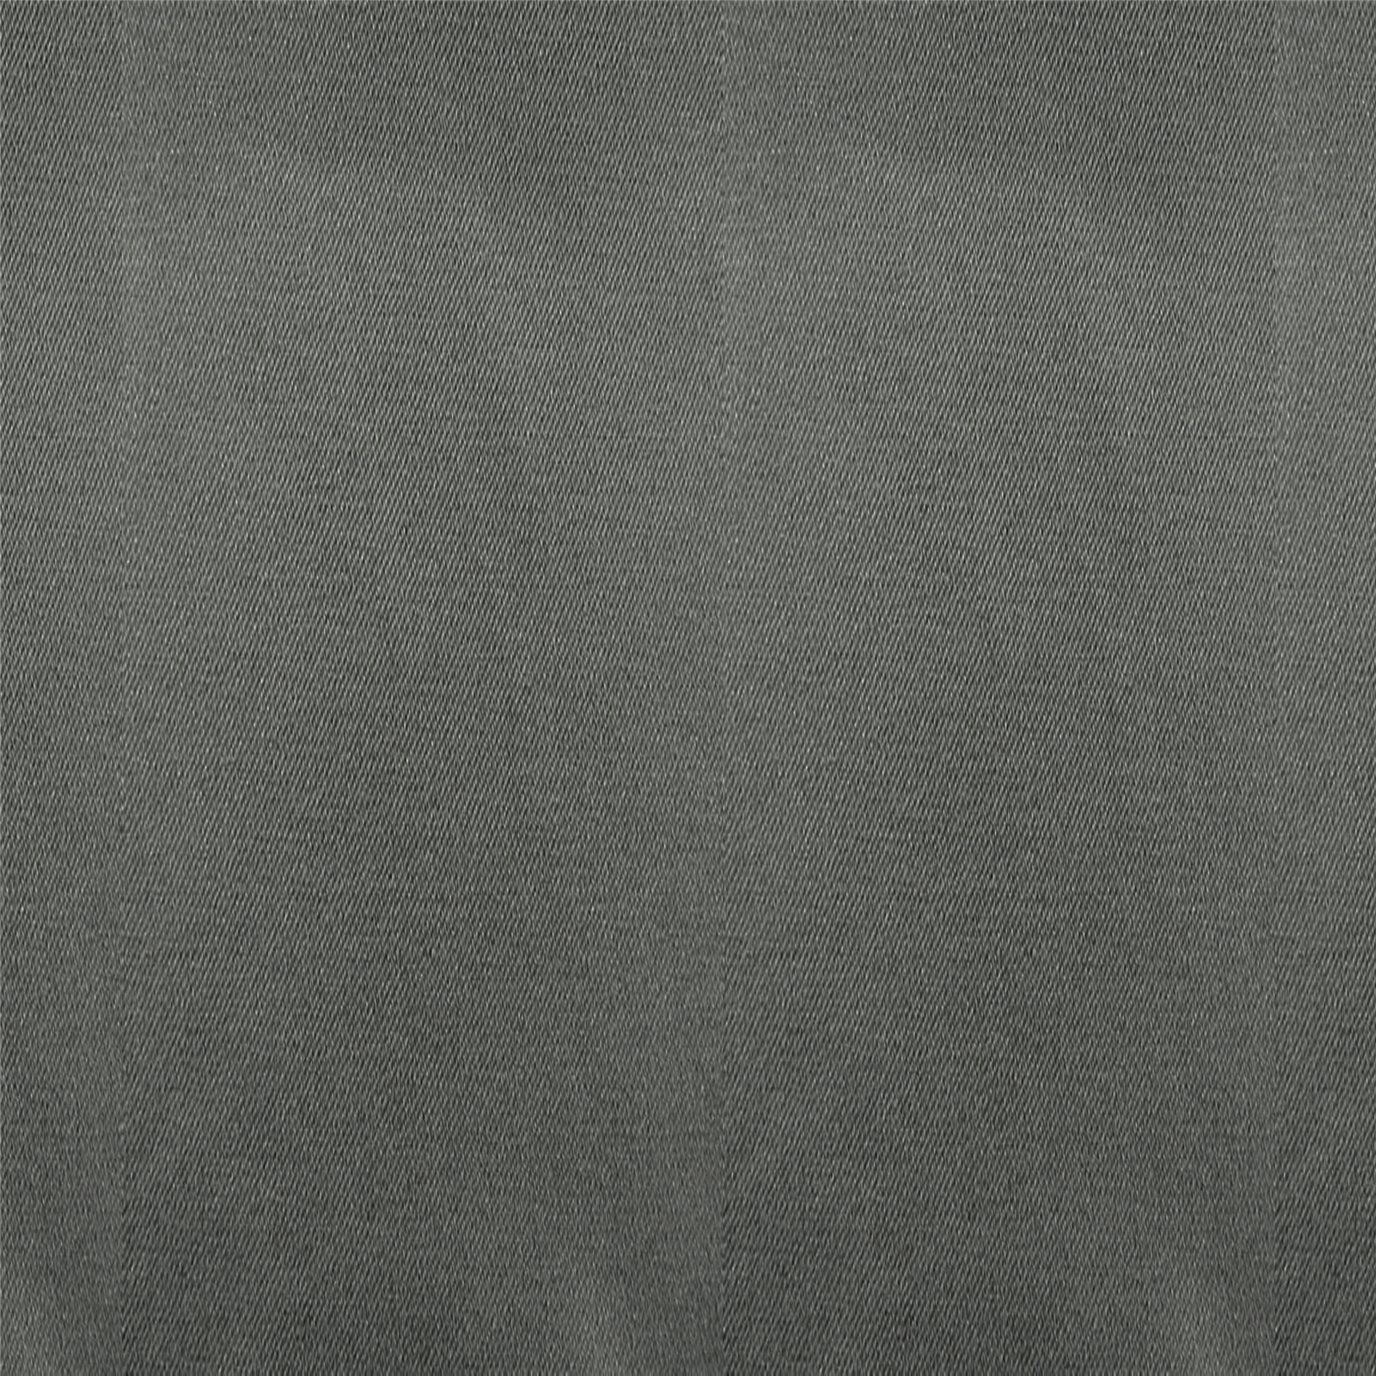 Harrow Charcoal Fabric by the Yard